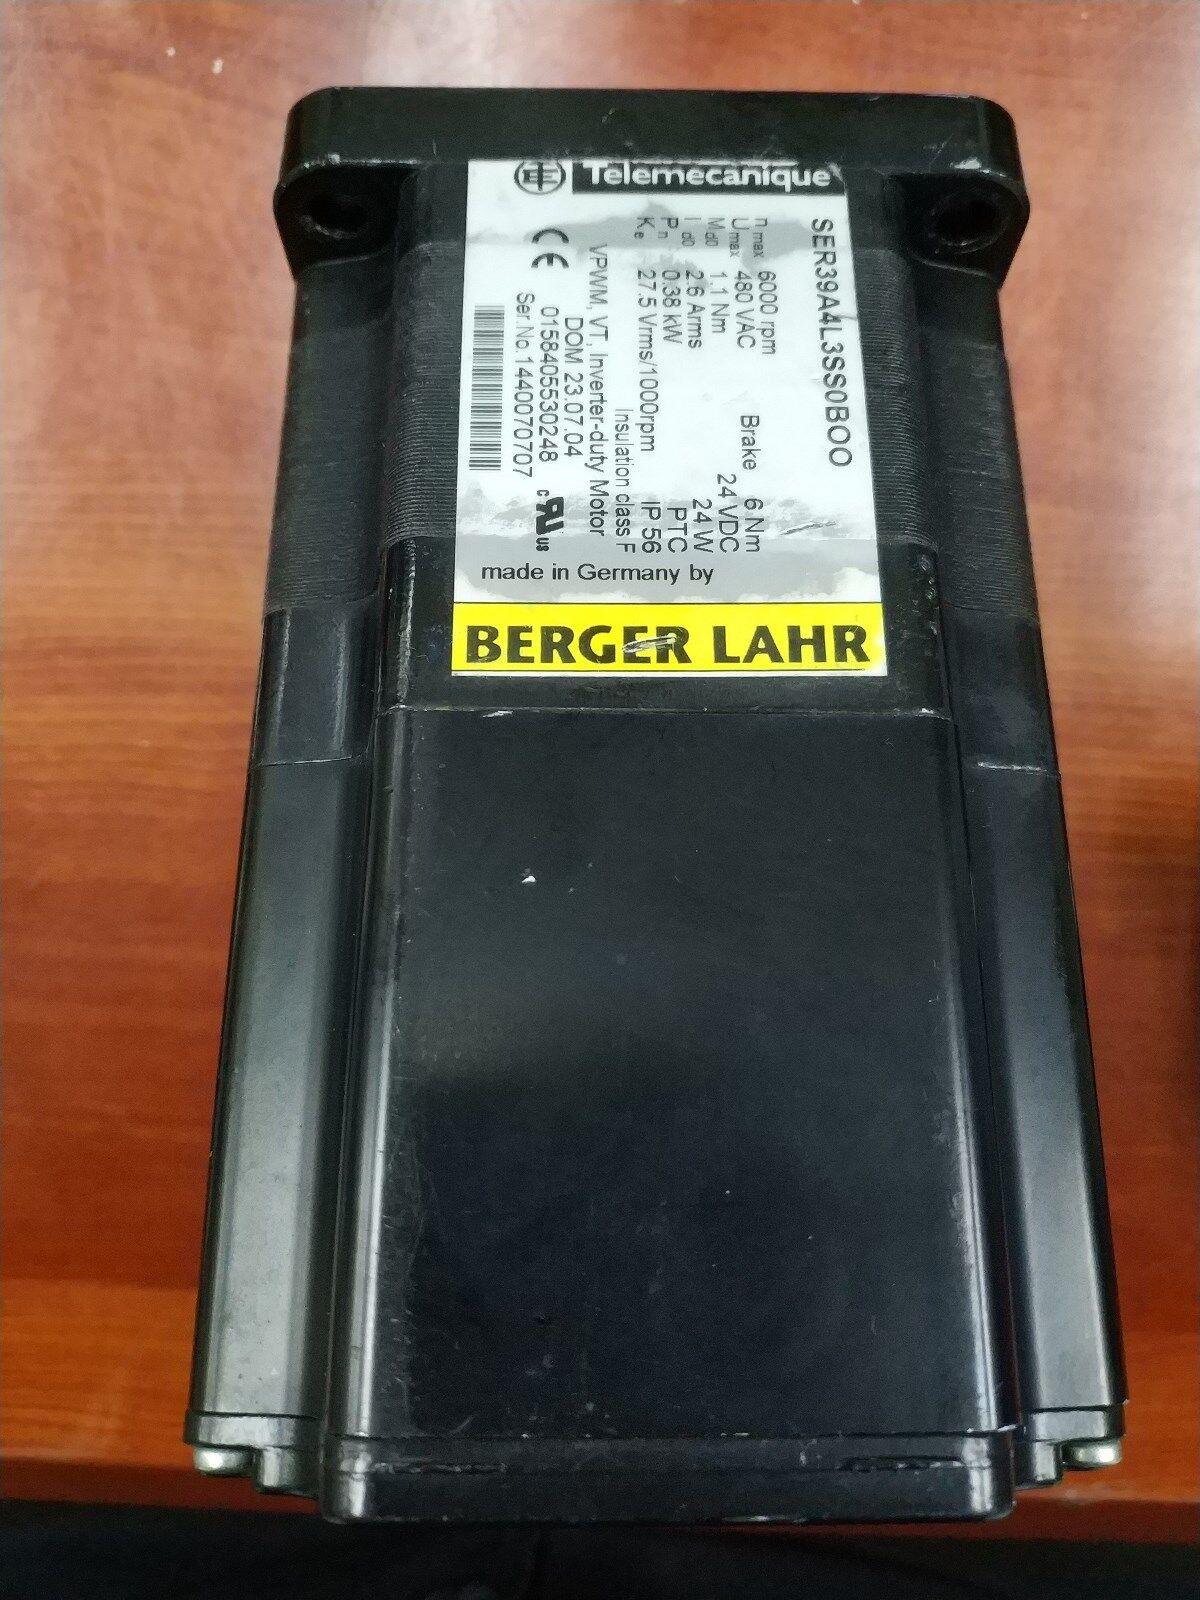 Berger Lahr  VW3M5101R50 SERVO MOTOR POWER SUPPLY CABLE 6ft